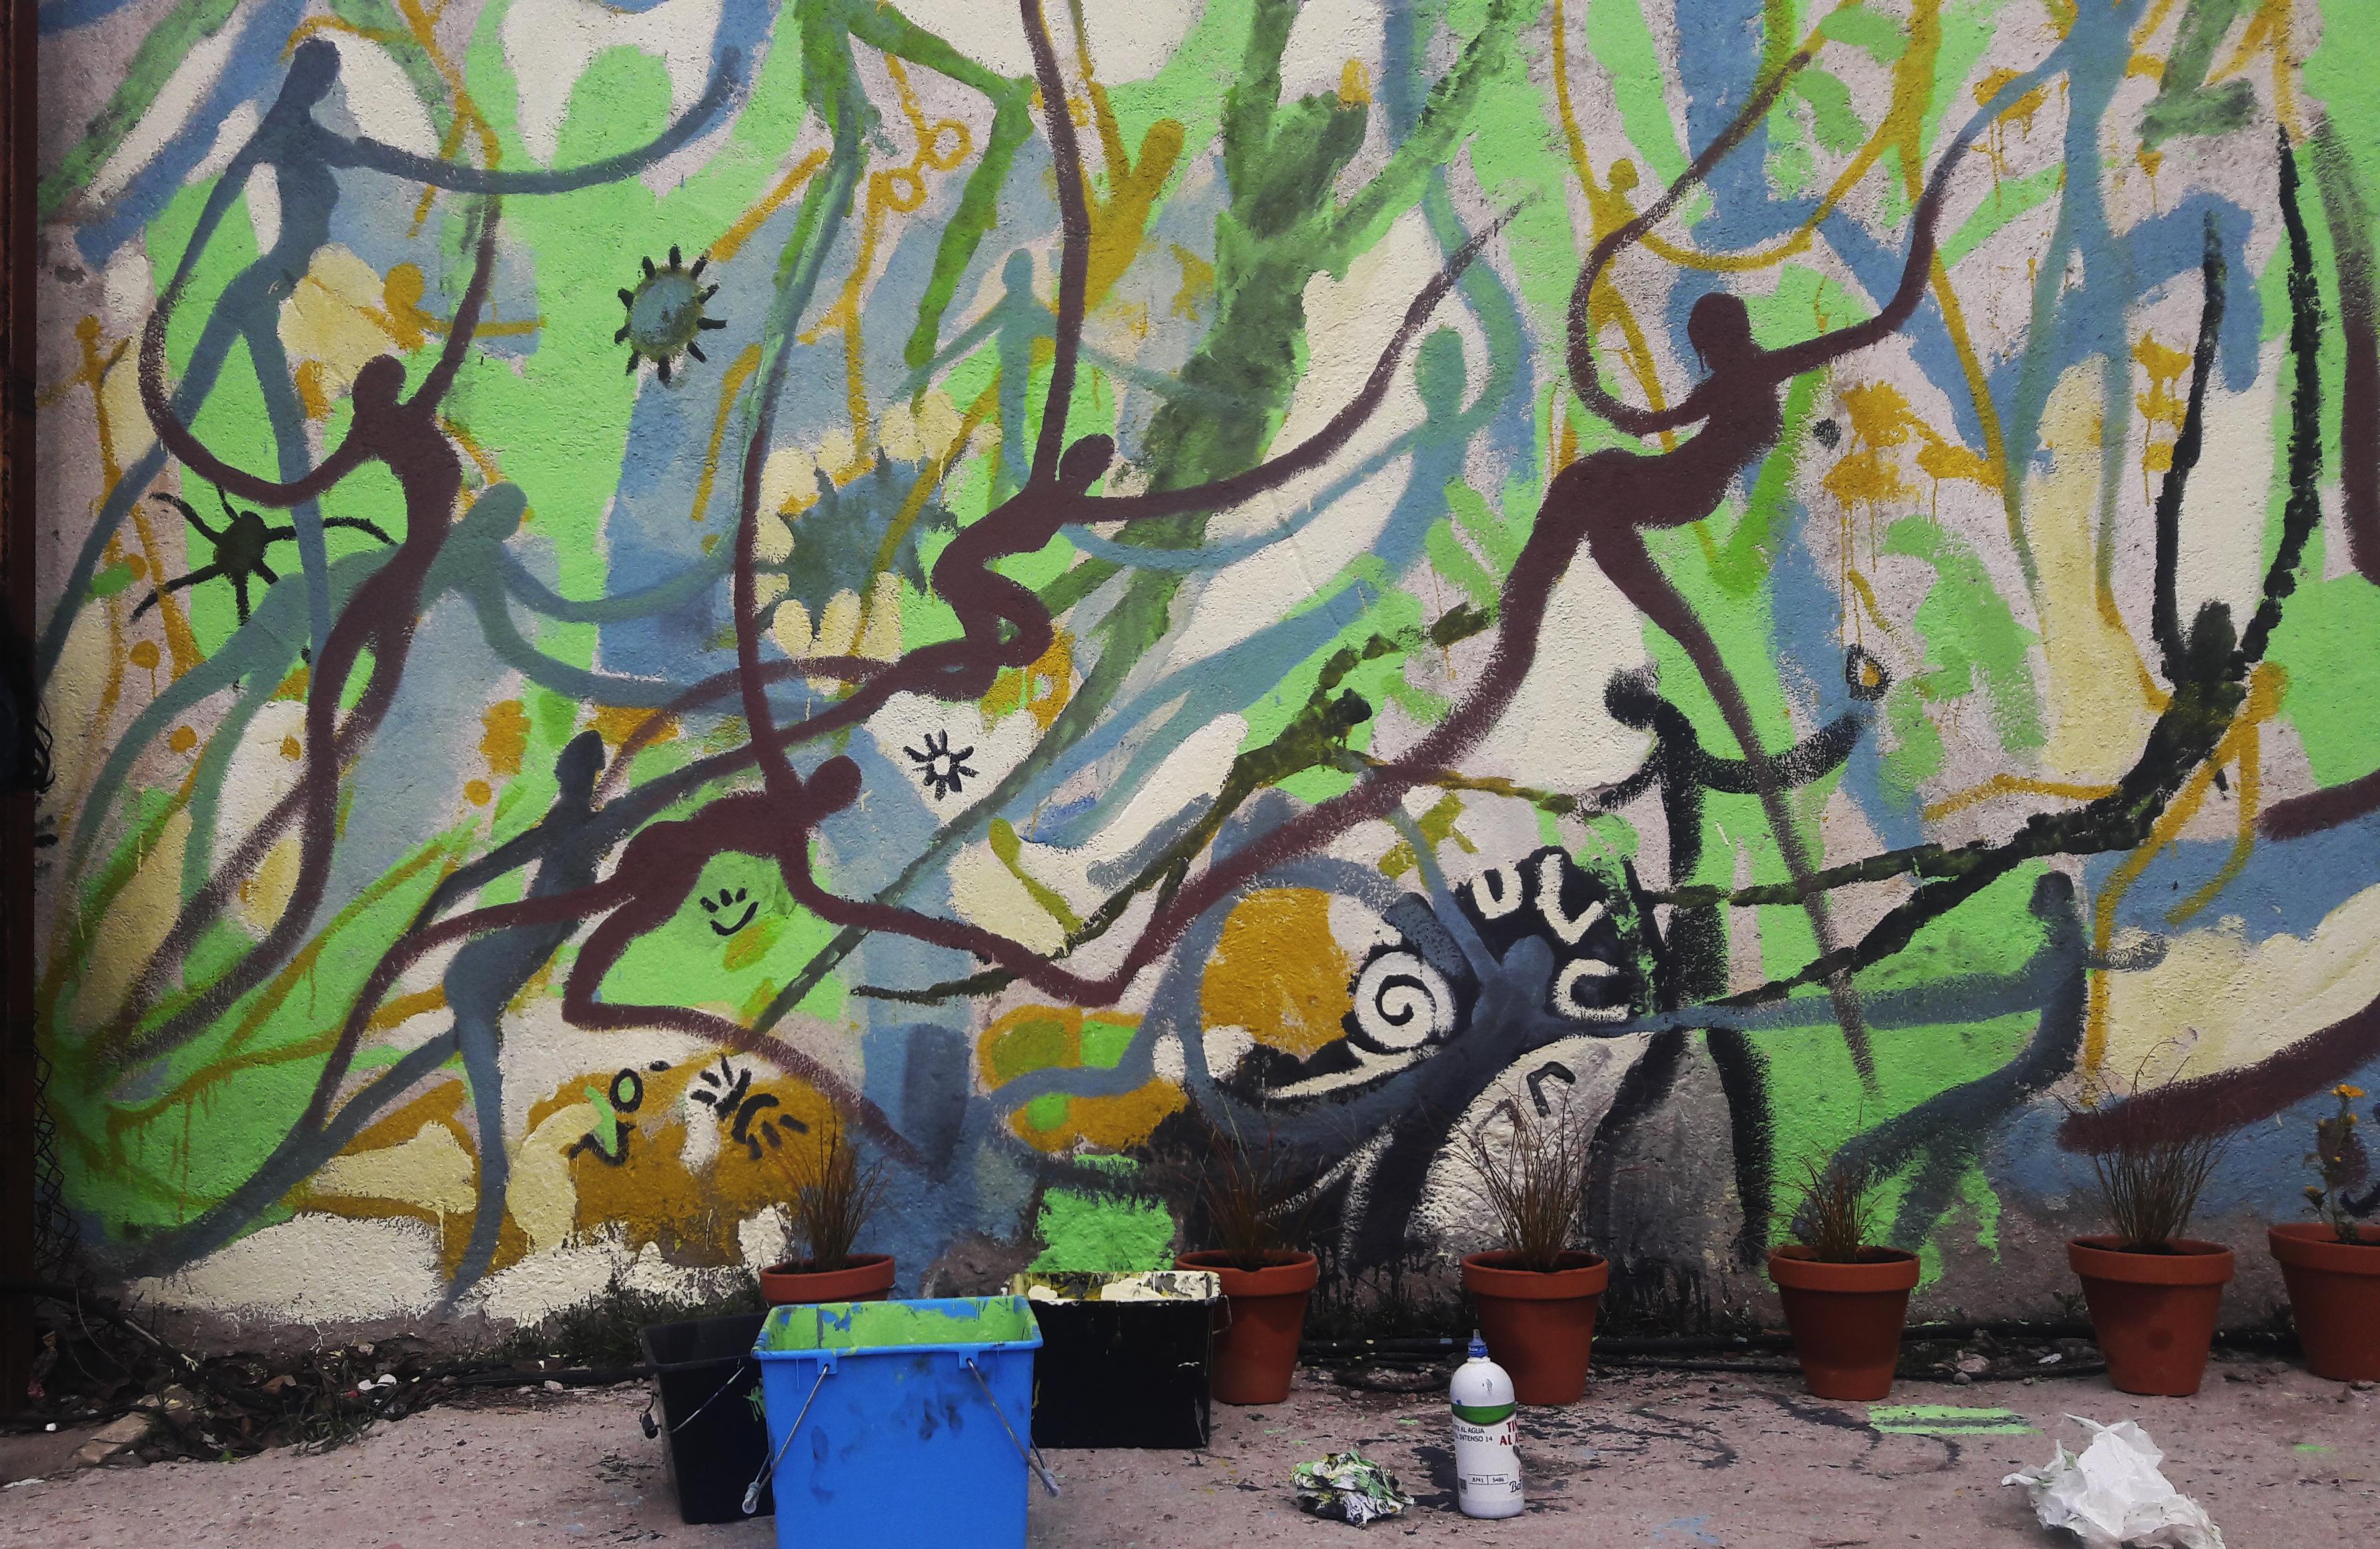 imprografika-el-mural-del-gonzalo-navarrete-2017-madrid-20170218_145522